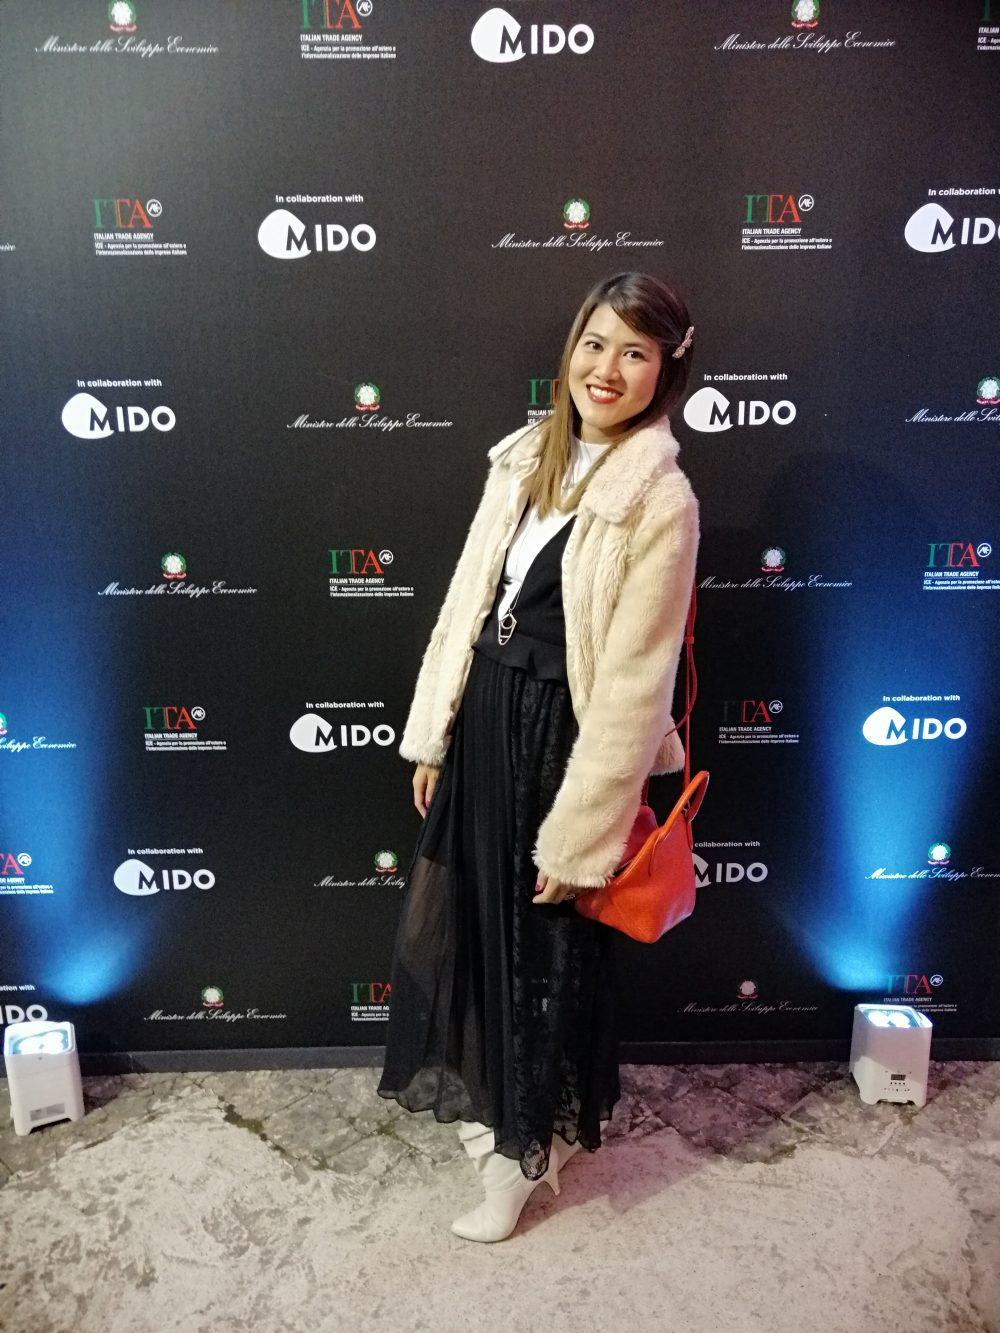 Mido 2019 Evening Gala